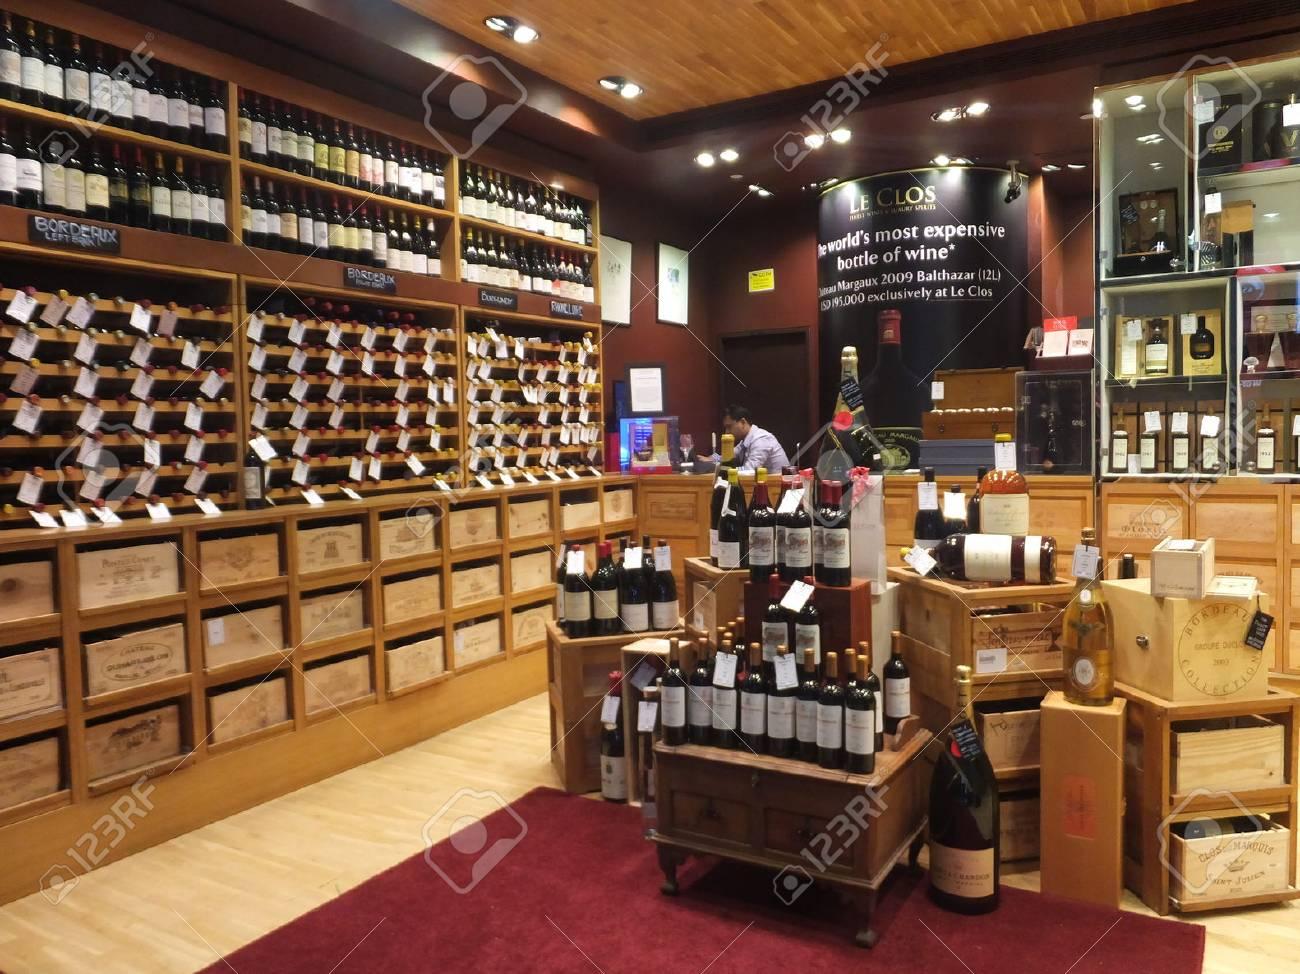 wine store at dubai duty at the international airport in stock photo wine store at dubai duty at the international airport in dubai uae